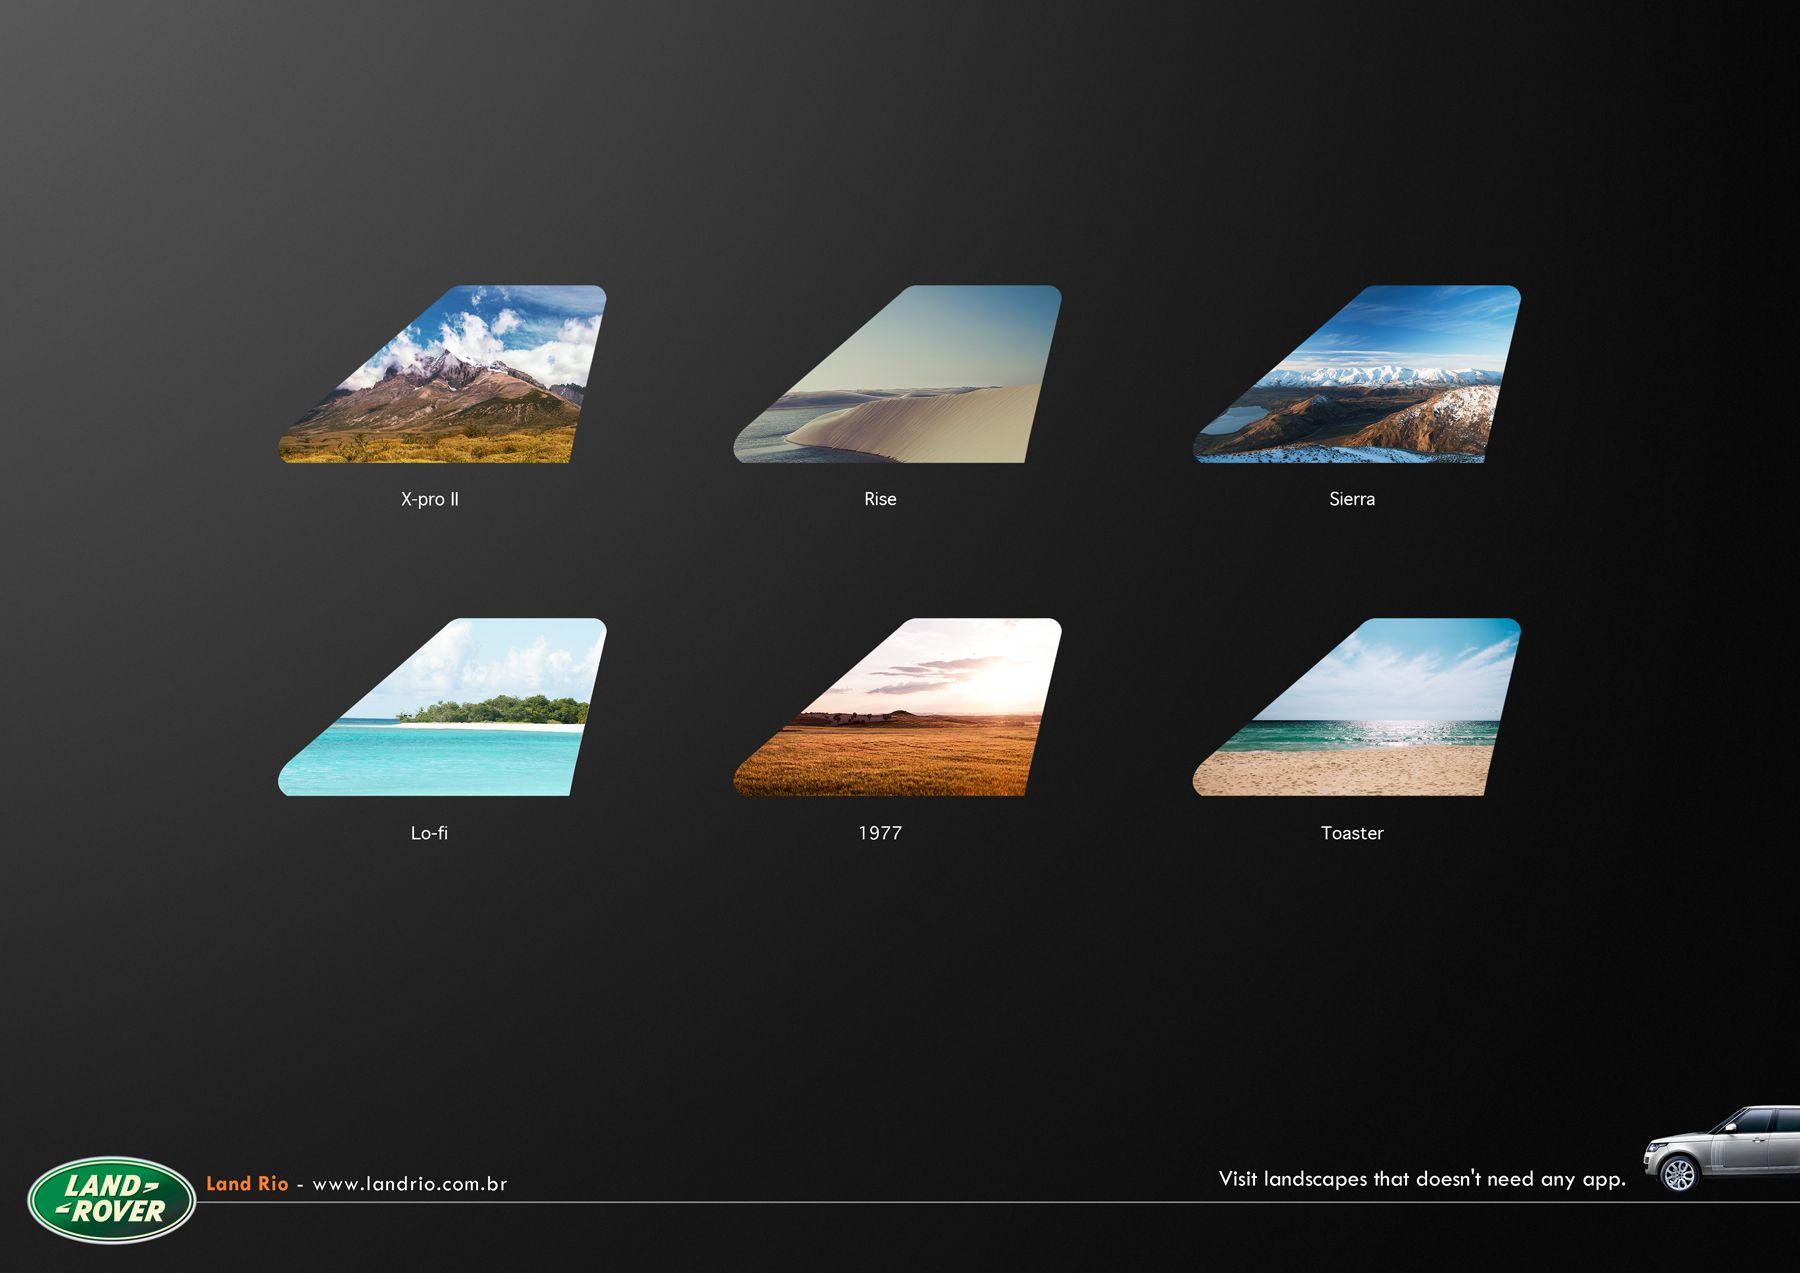 Land Rover / Land Rio App ads marketing creative